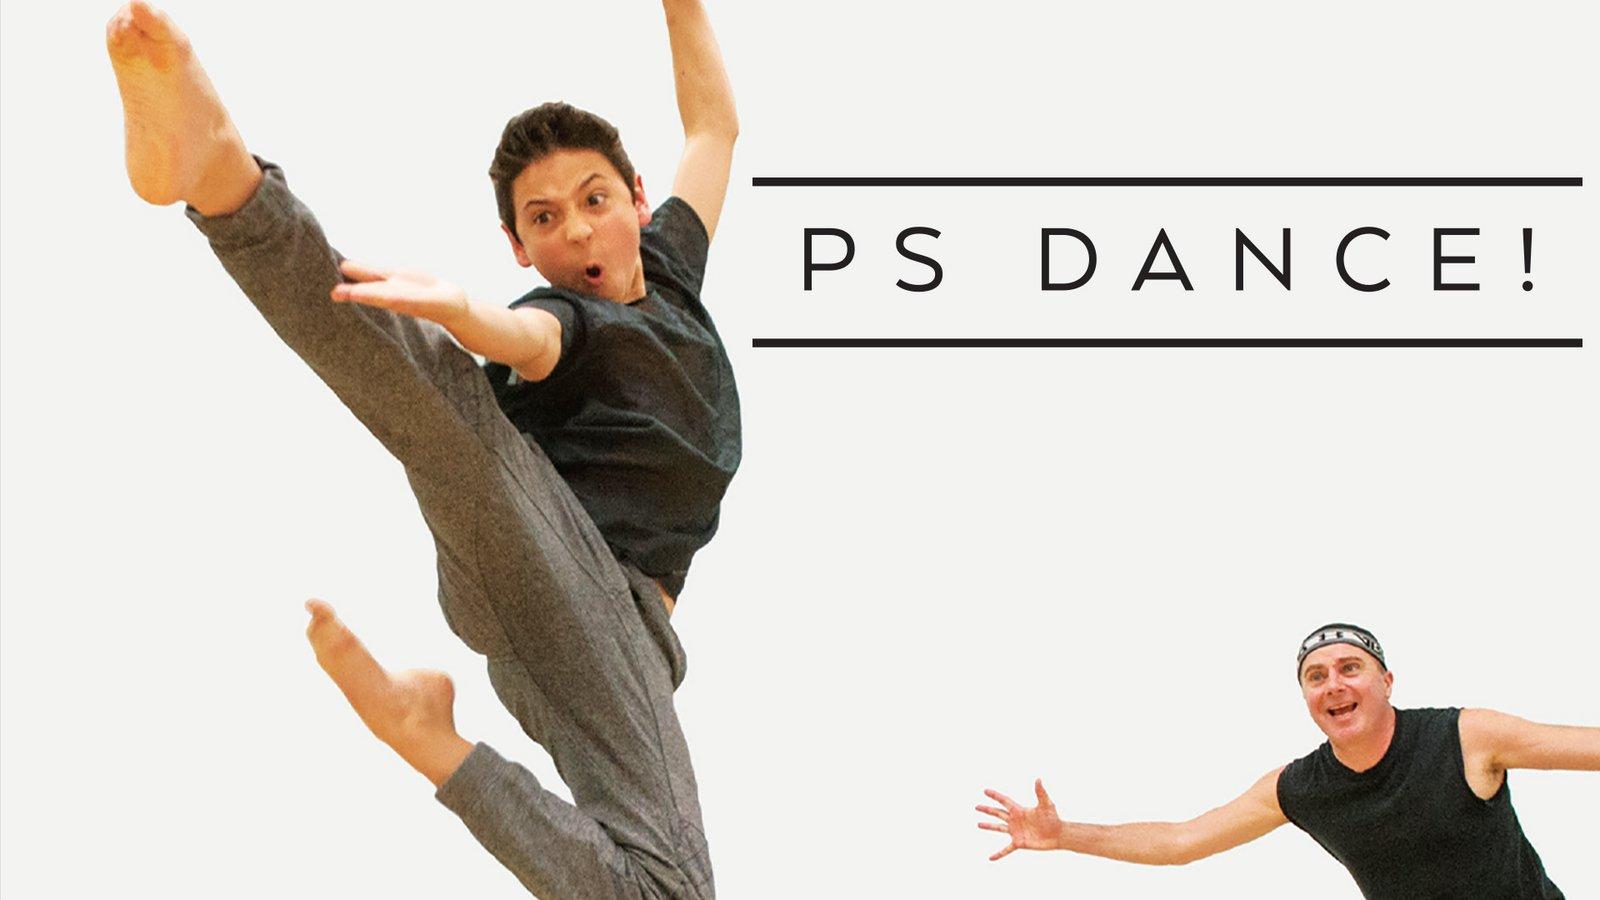 PS Dance! Dance Education in Public Schools